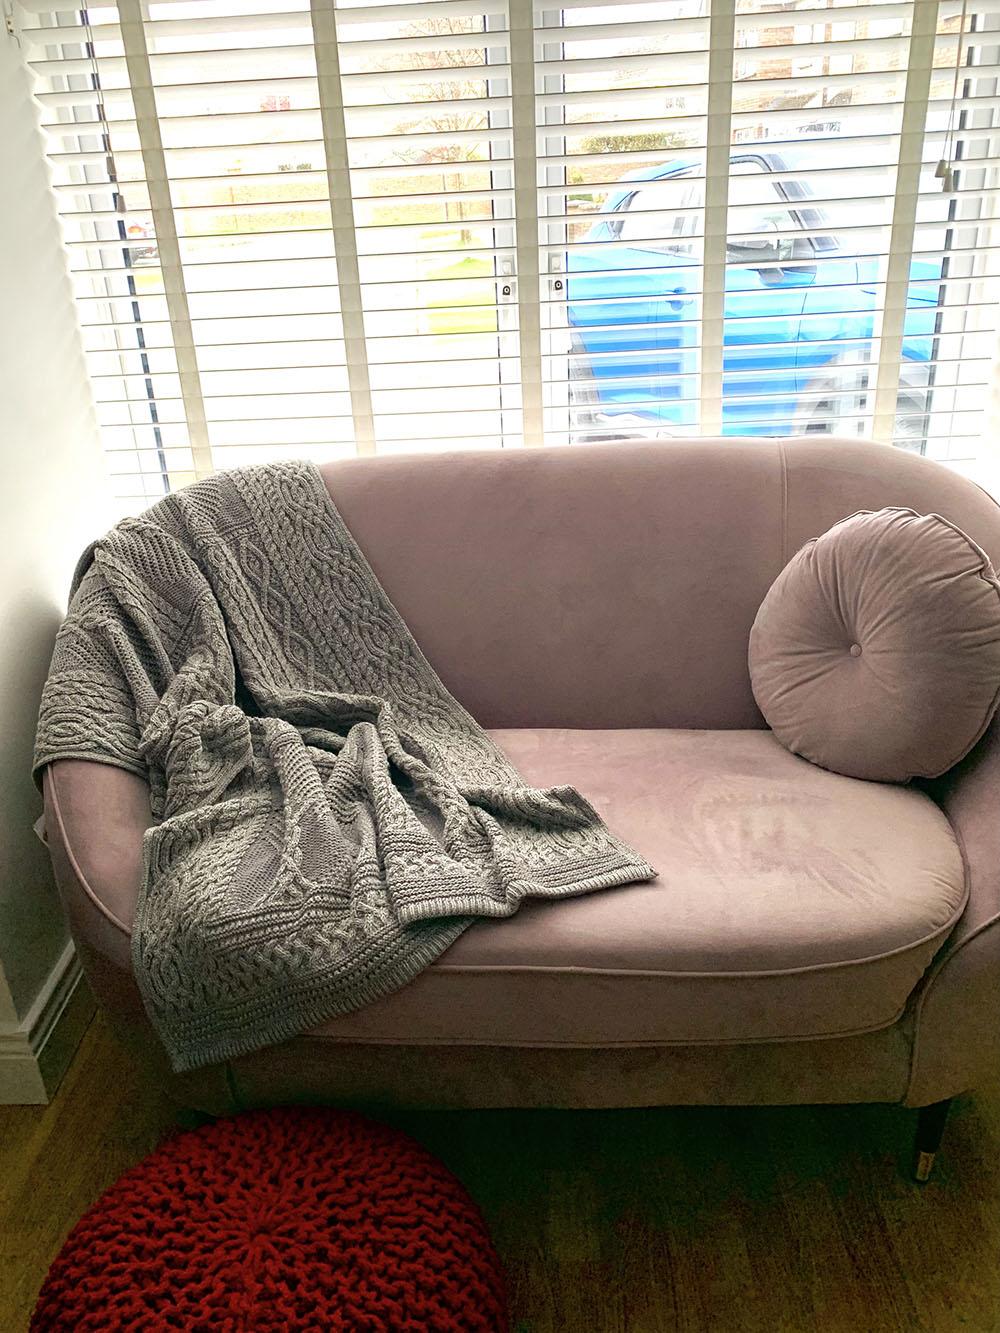 Kooper sofa from Maria